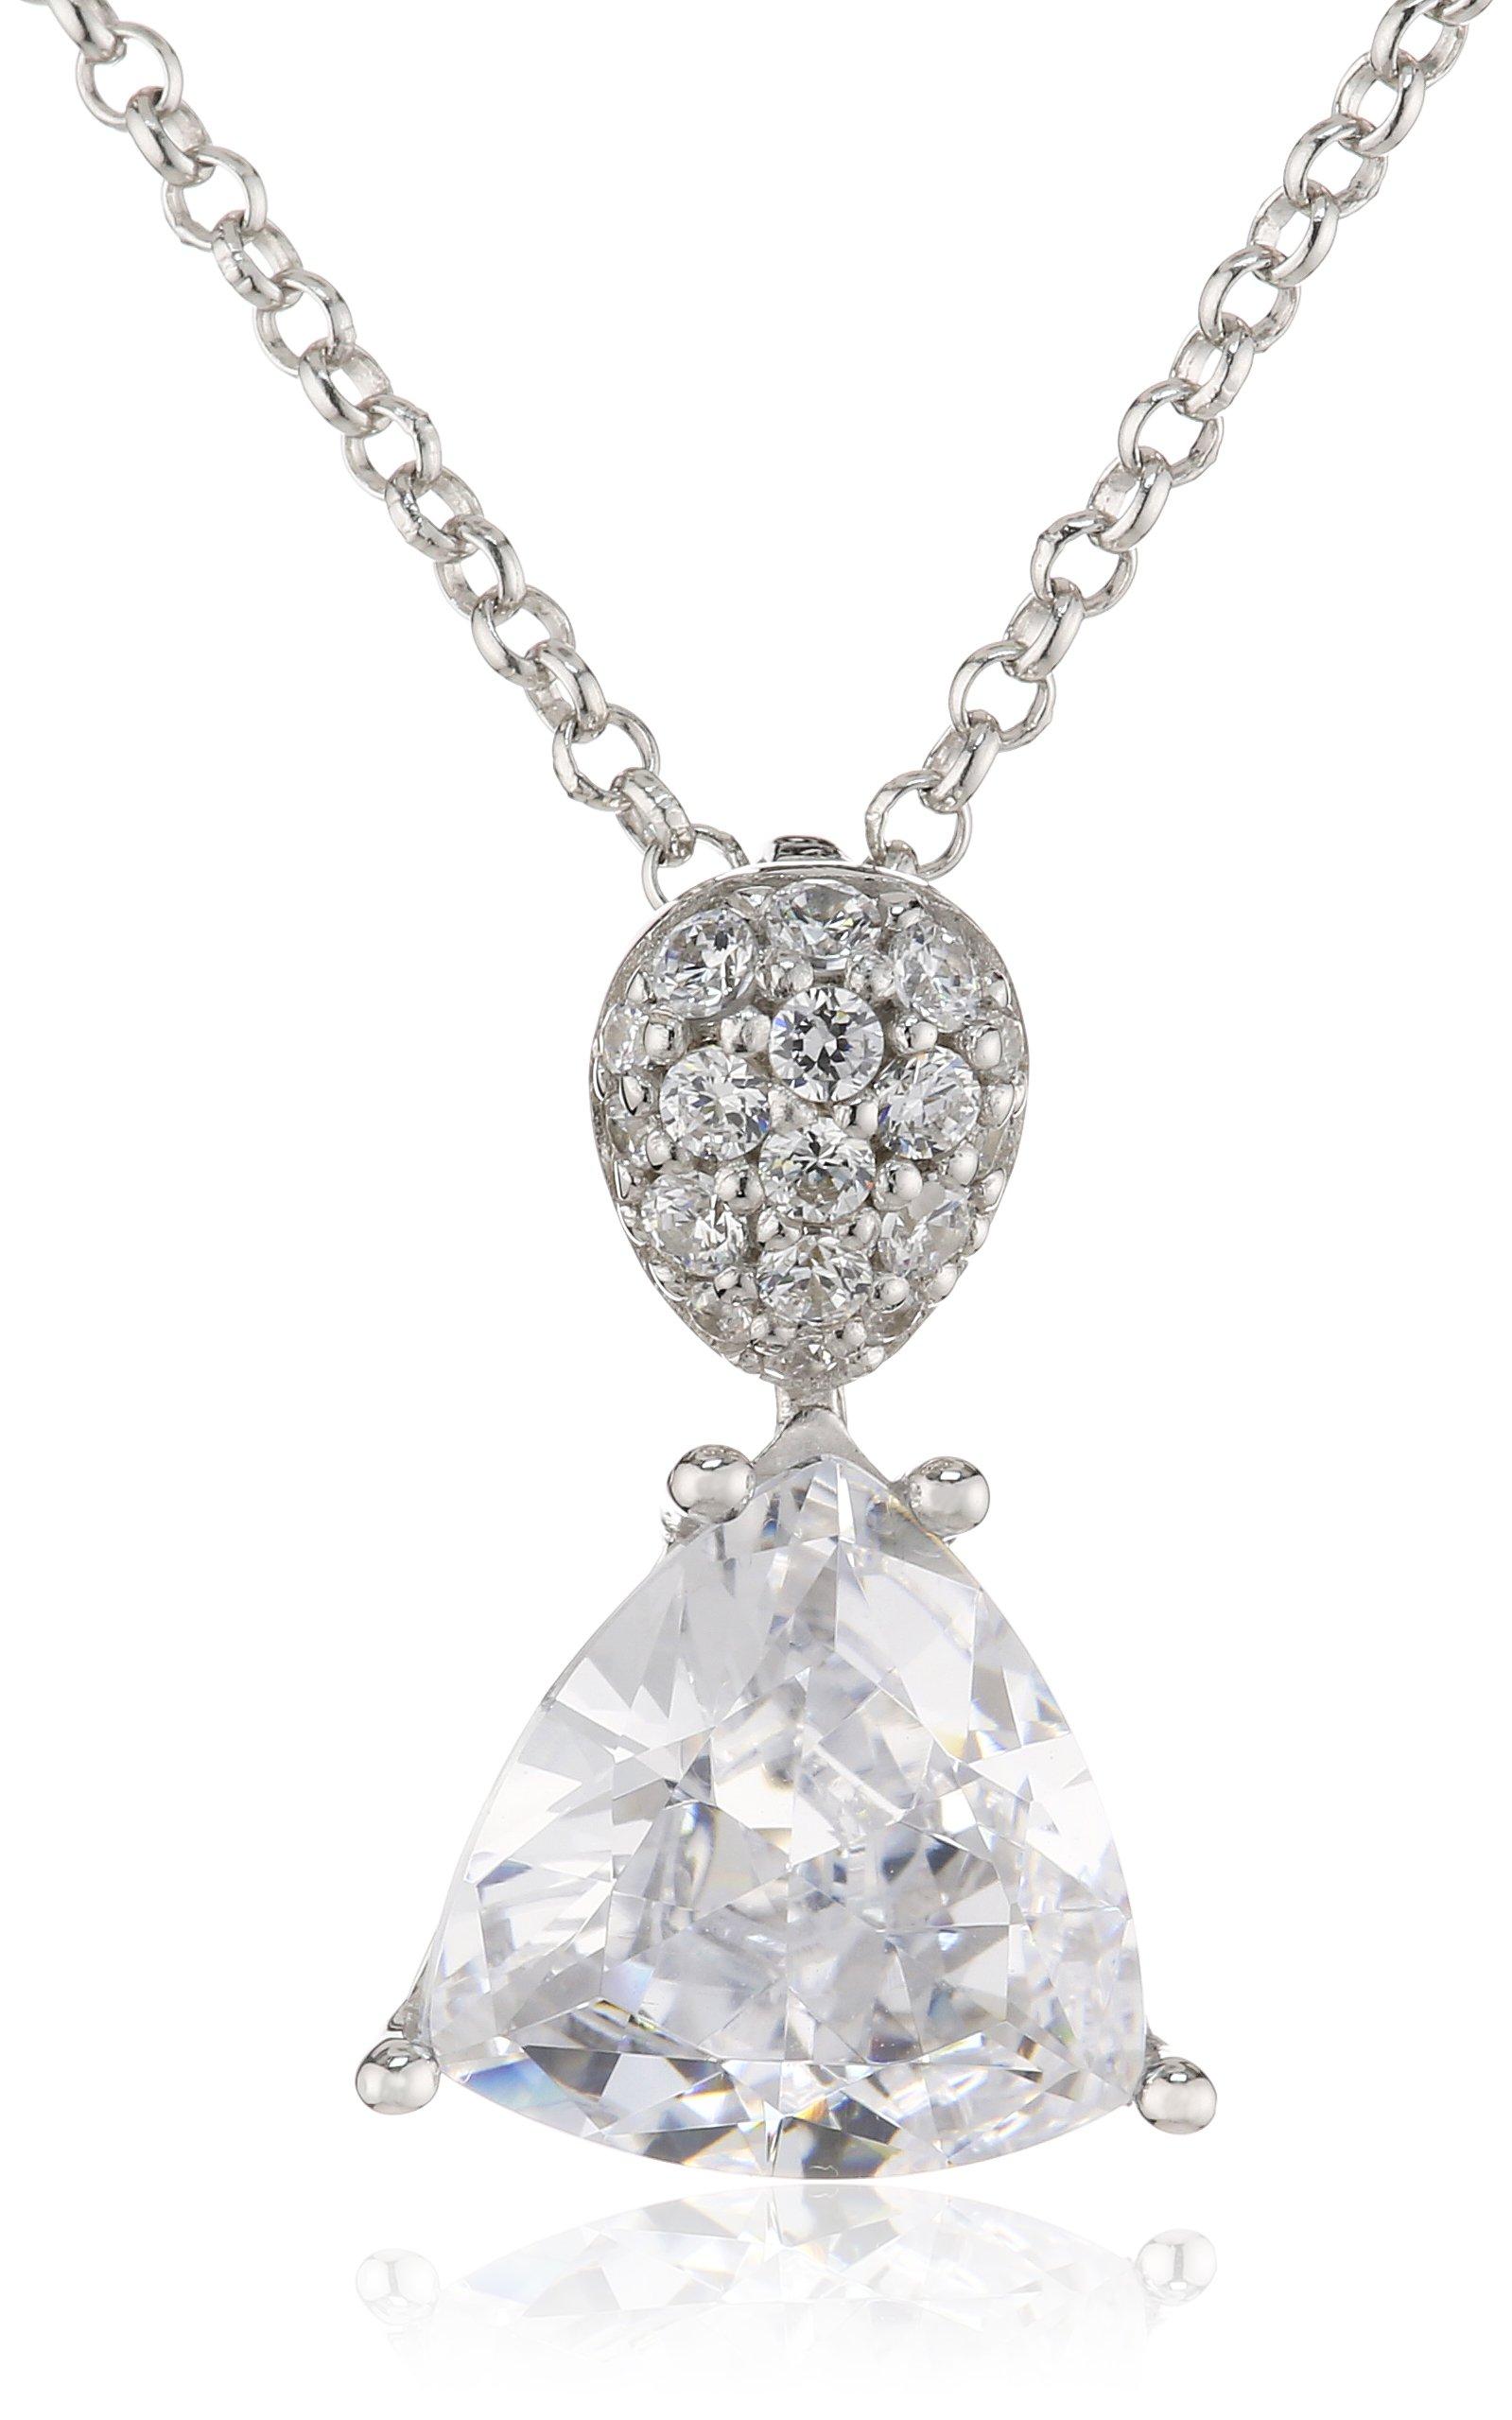 Joop! Jewelry Aurora JPNL90642B420 womans necklace With Zircons